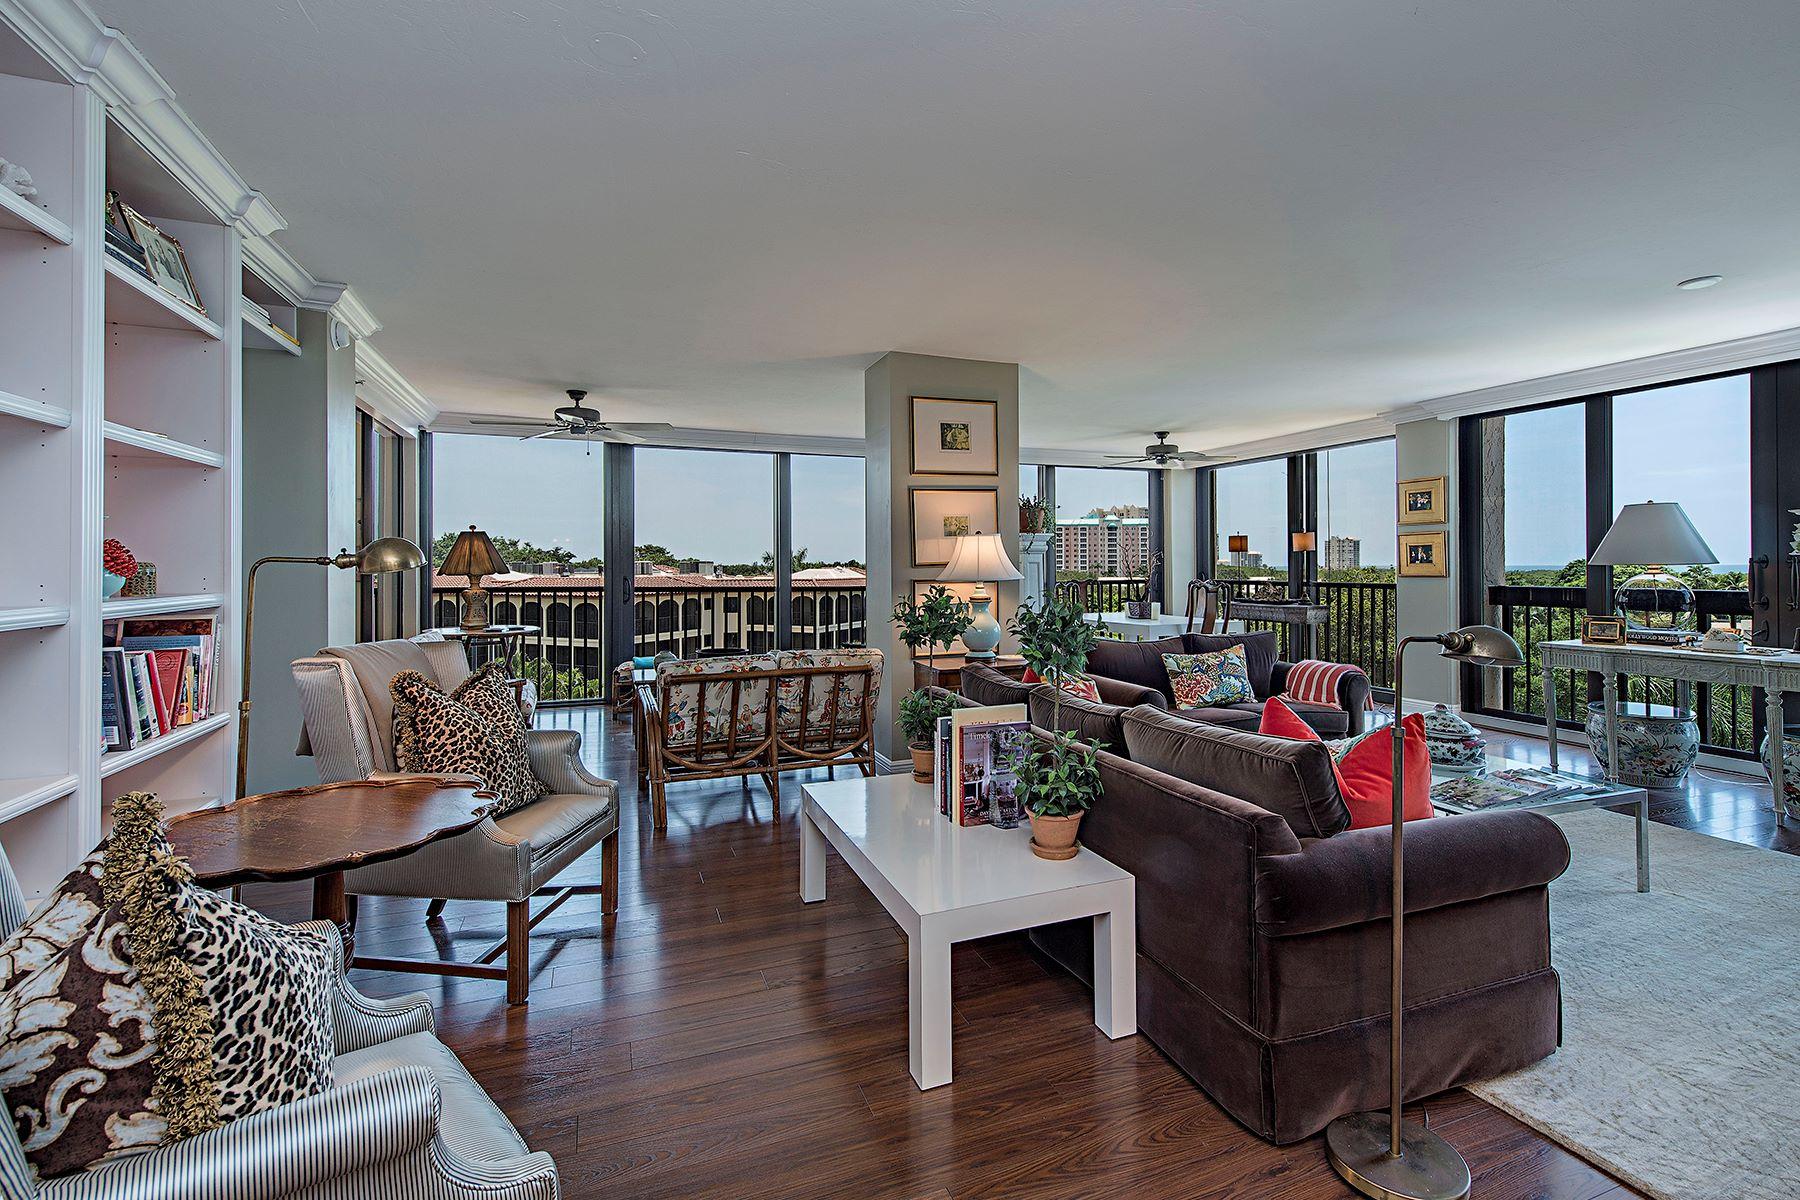 Condominium for Sale at PELICAN BAY - CHATEAUMERE 6000 Pelican Bay Blvd C-402 Naples, Florida, 34108 United States